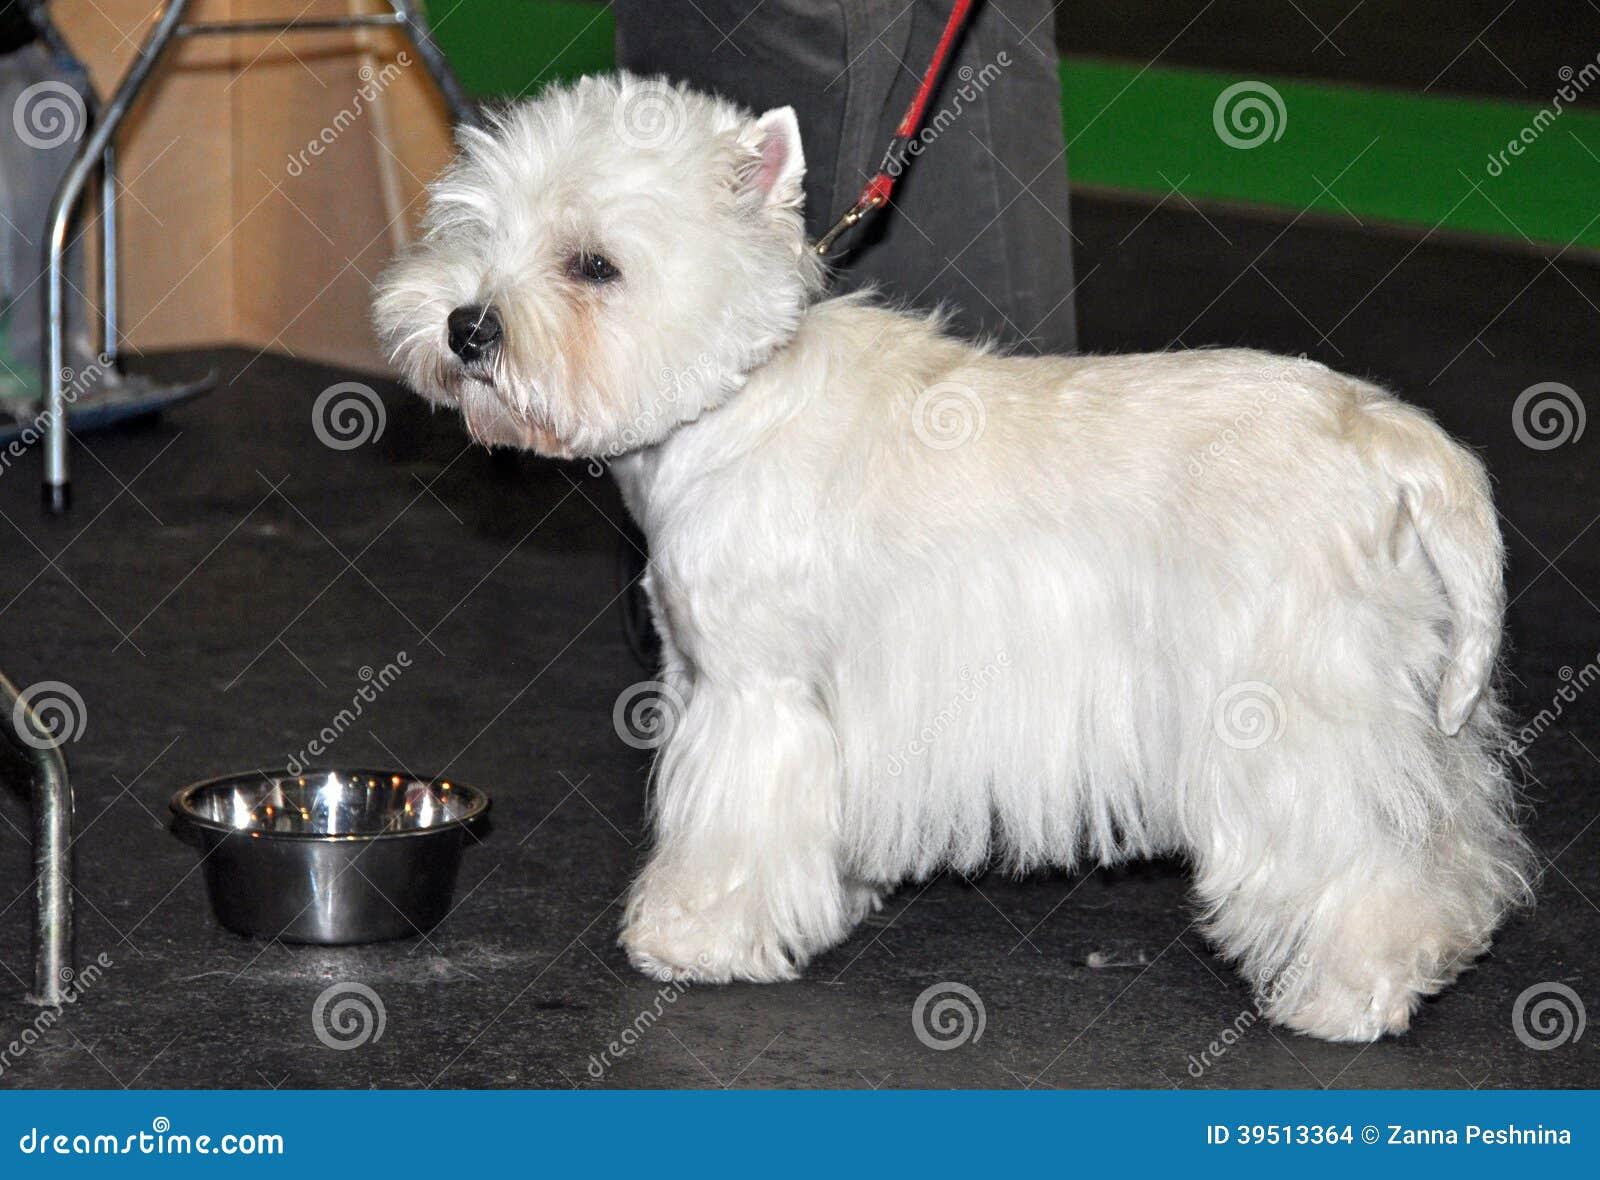 Dog Bichon Frise drinking water